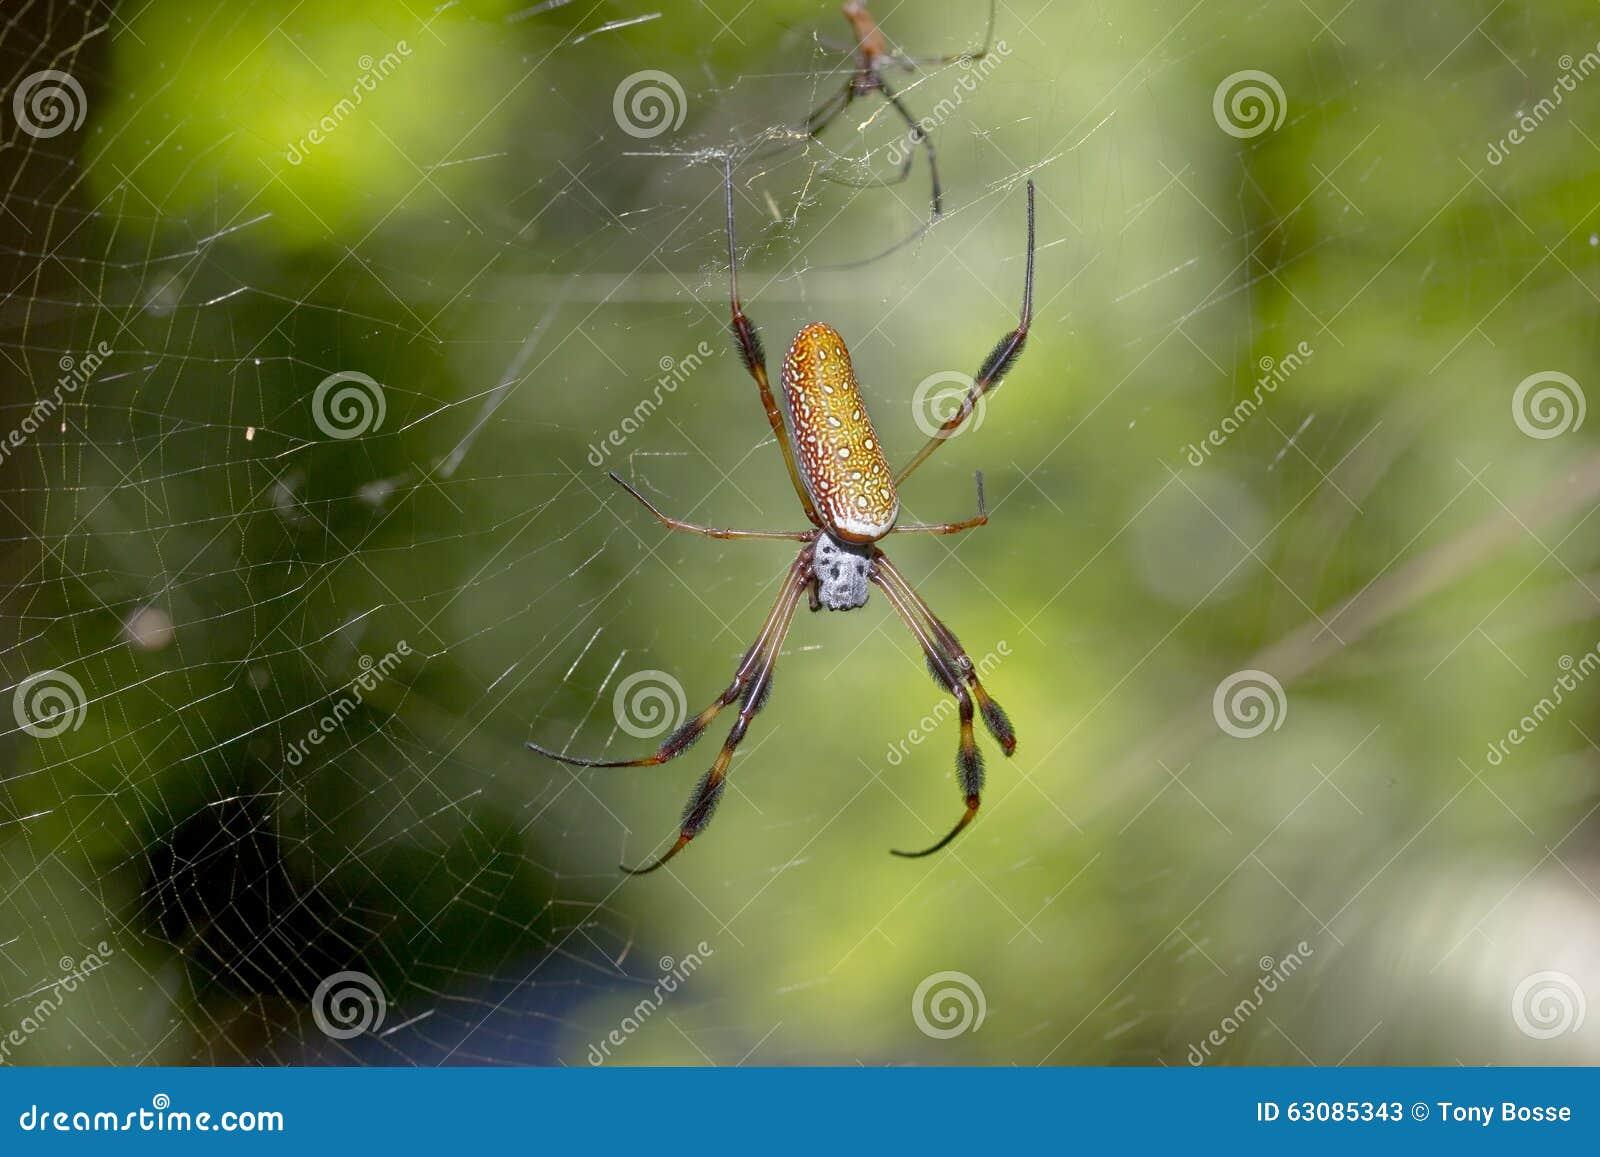 Download Araignée de banane image stock. Image du animal, spiderweb - 63085343